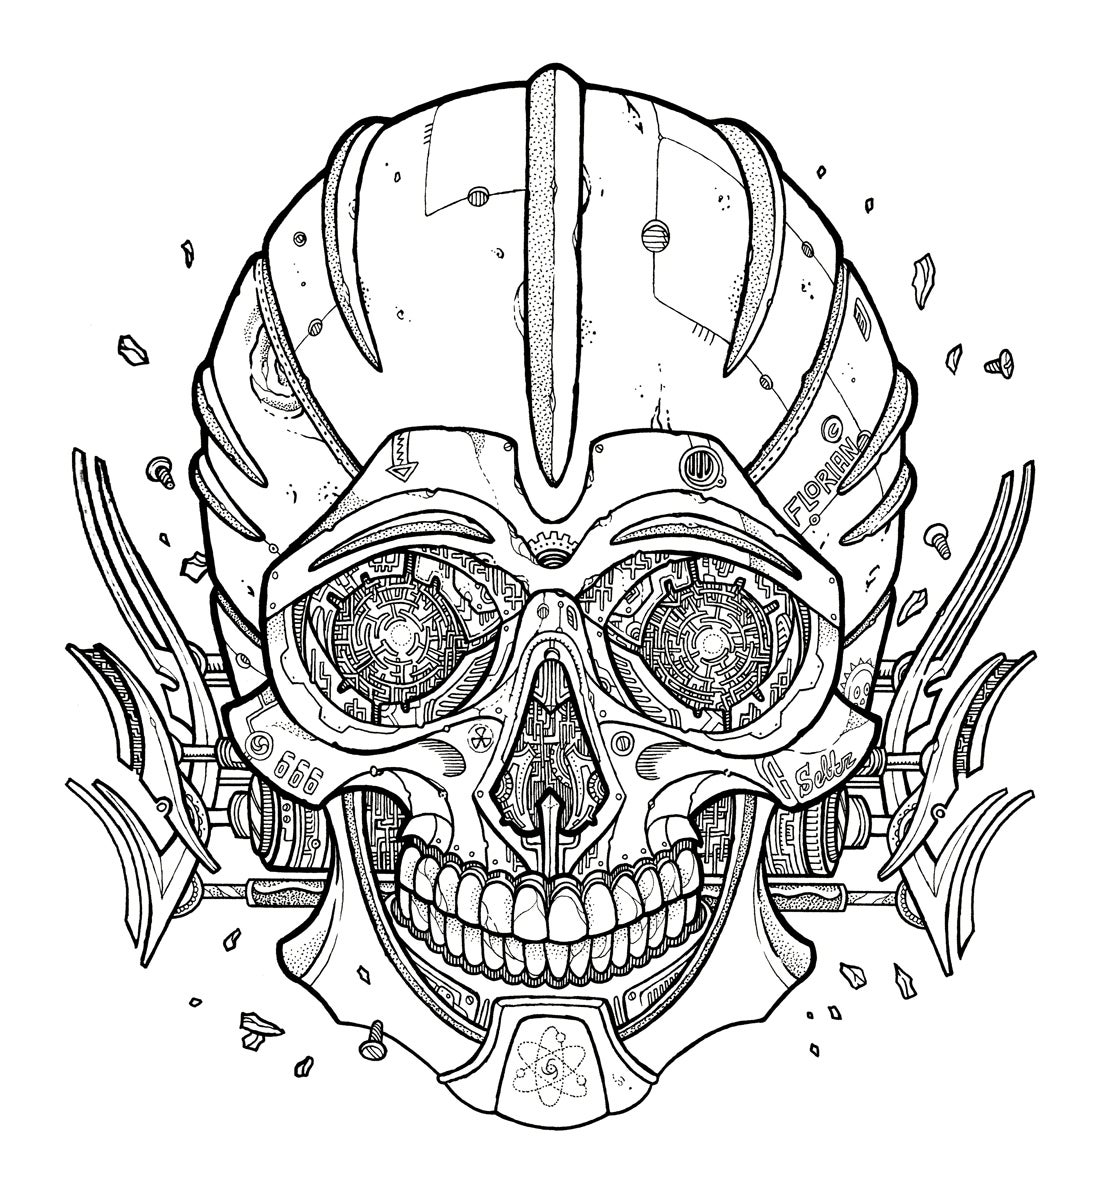 Image of Darrow skull - Original Artwork